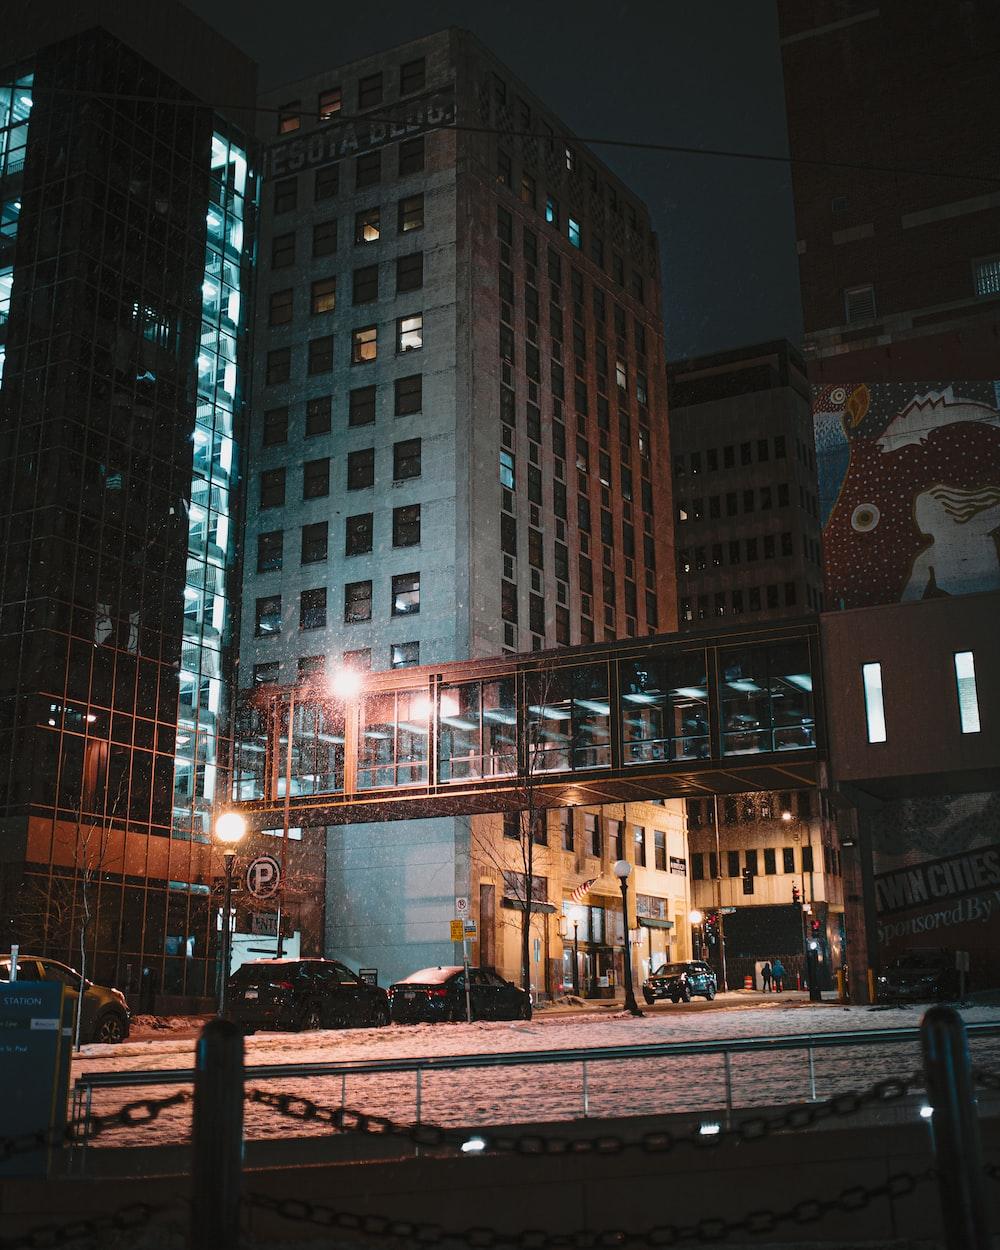 people walking on sidewalk near high rise buildings during night time